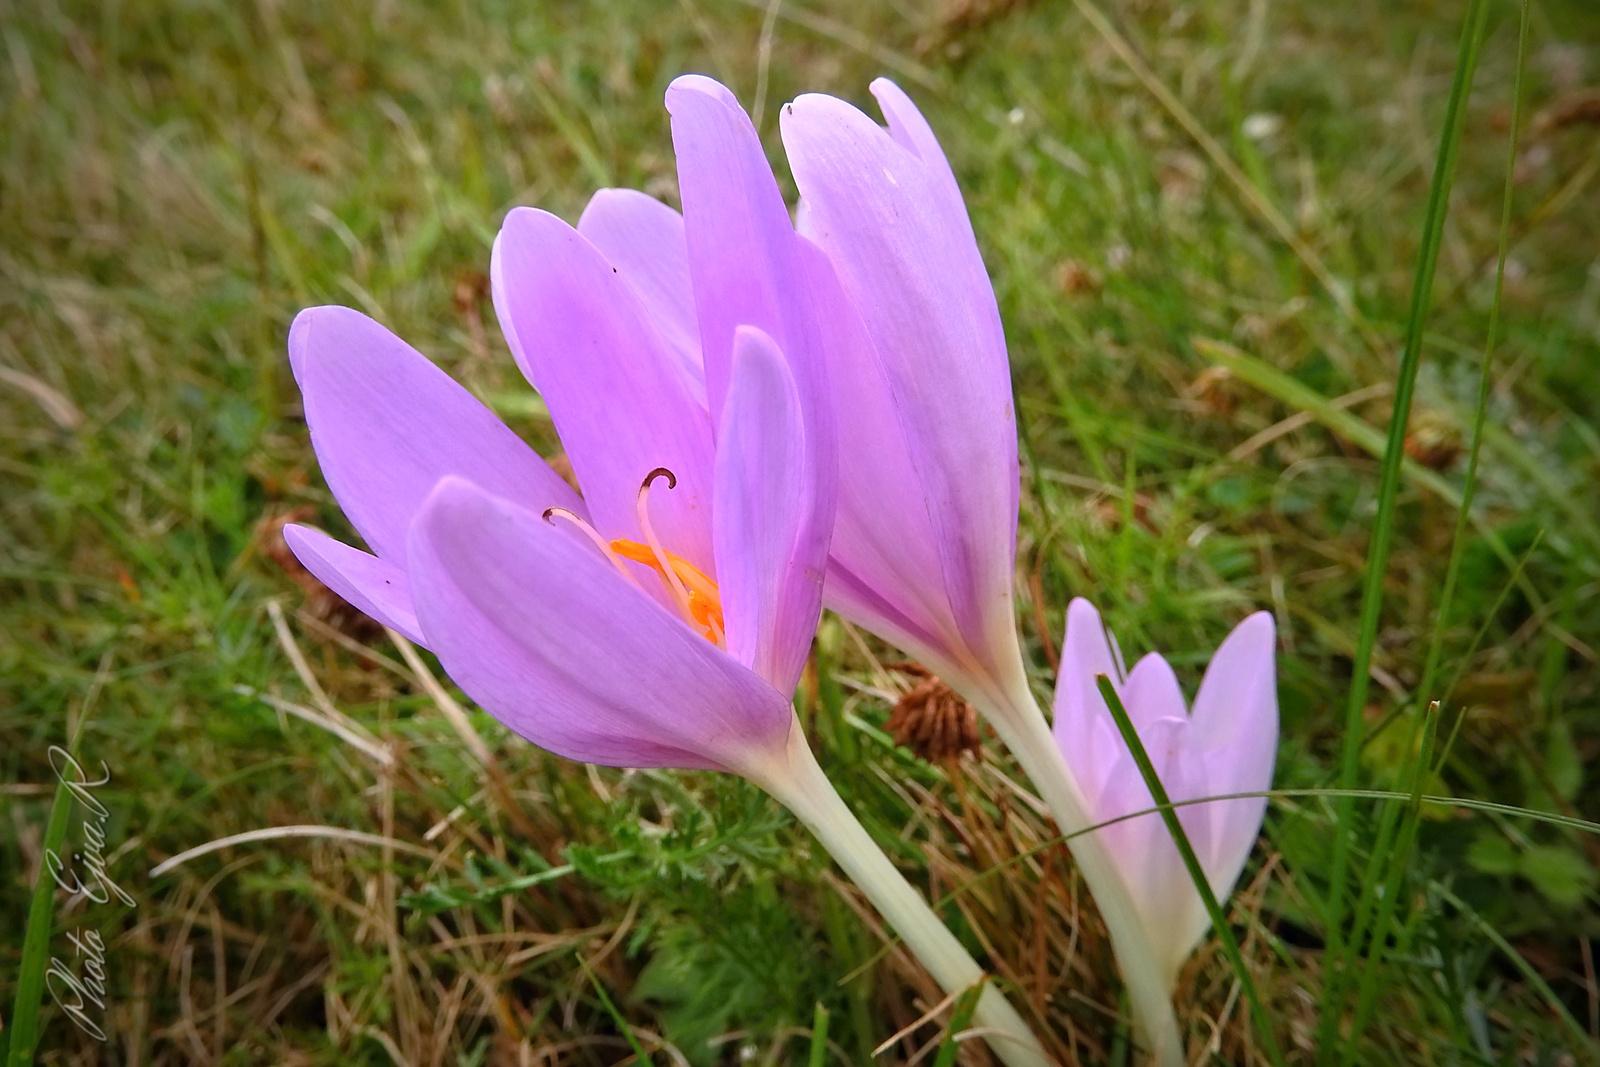 Őszi kikerics (Colchicum autumnale)